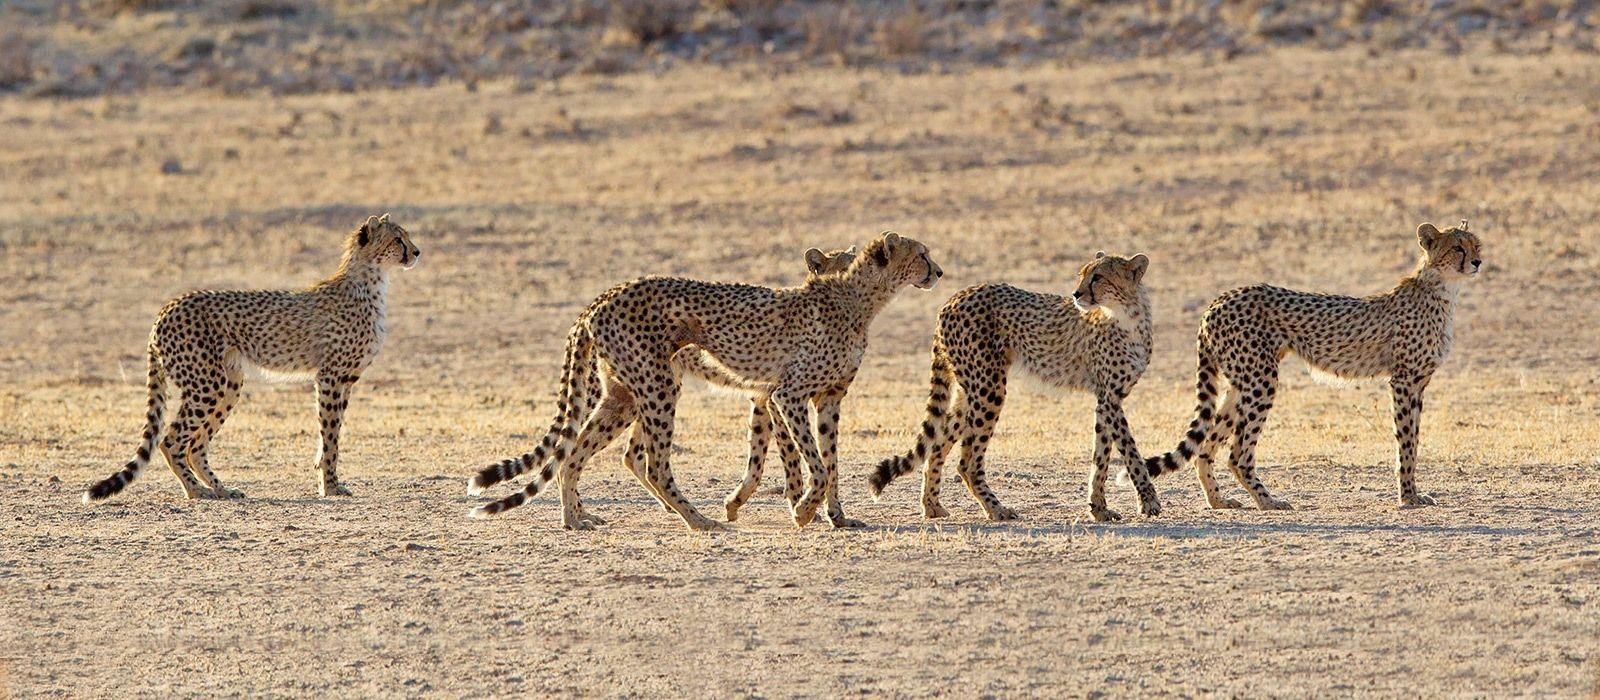 Reiseziel Kalahari Wüste (Nambia) Südafrika